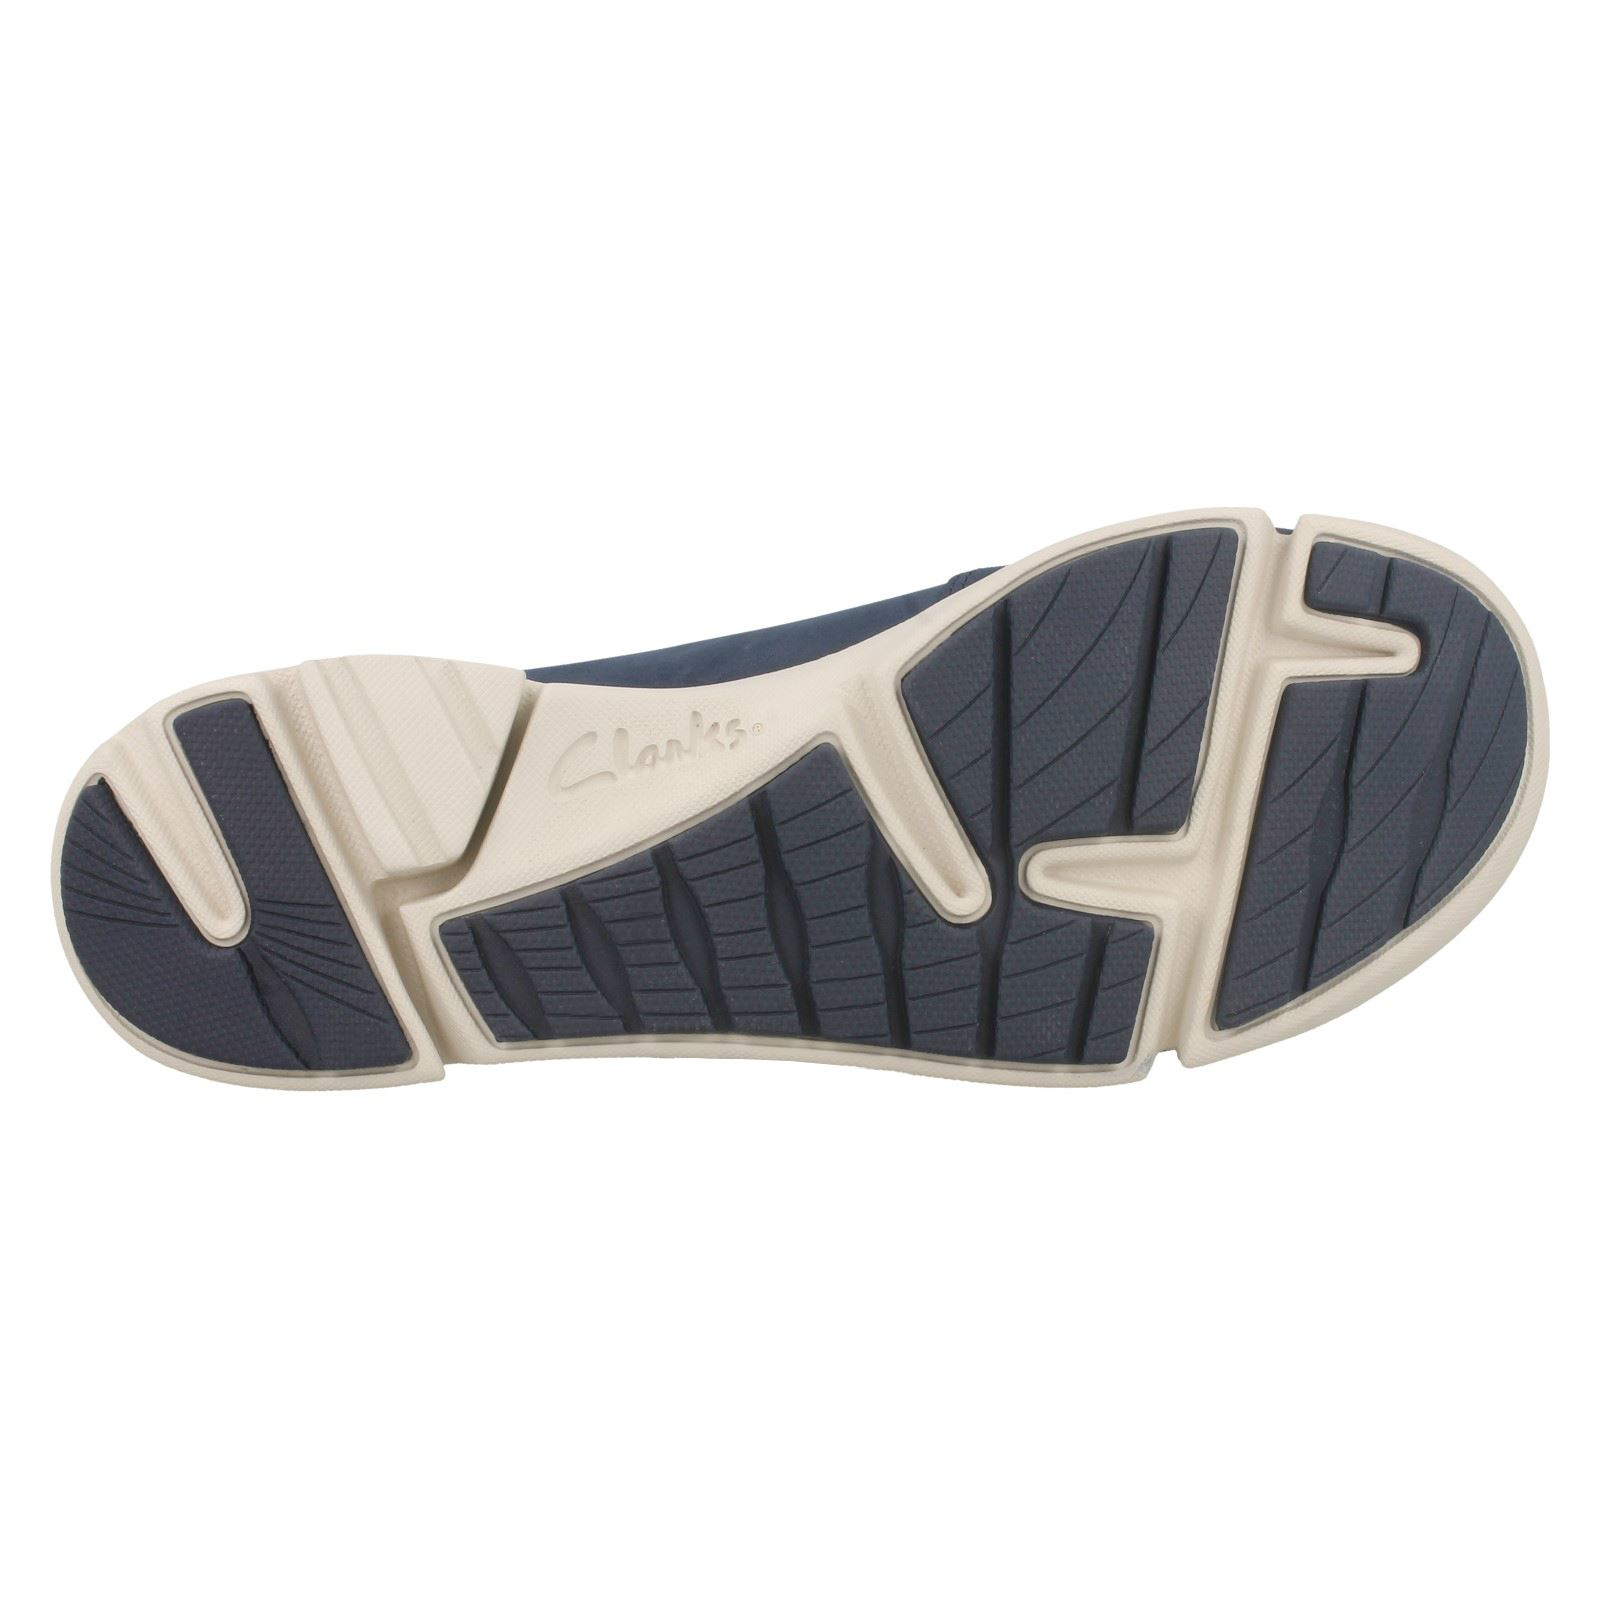 Clarks Ladies Casual Shoes Tri Ava